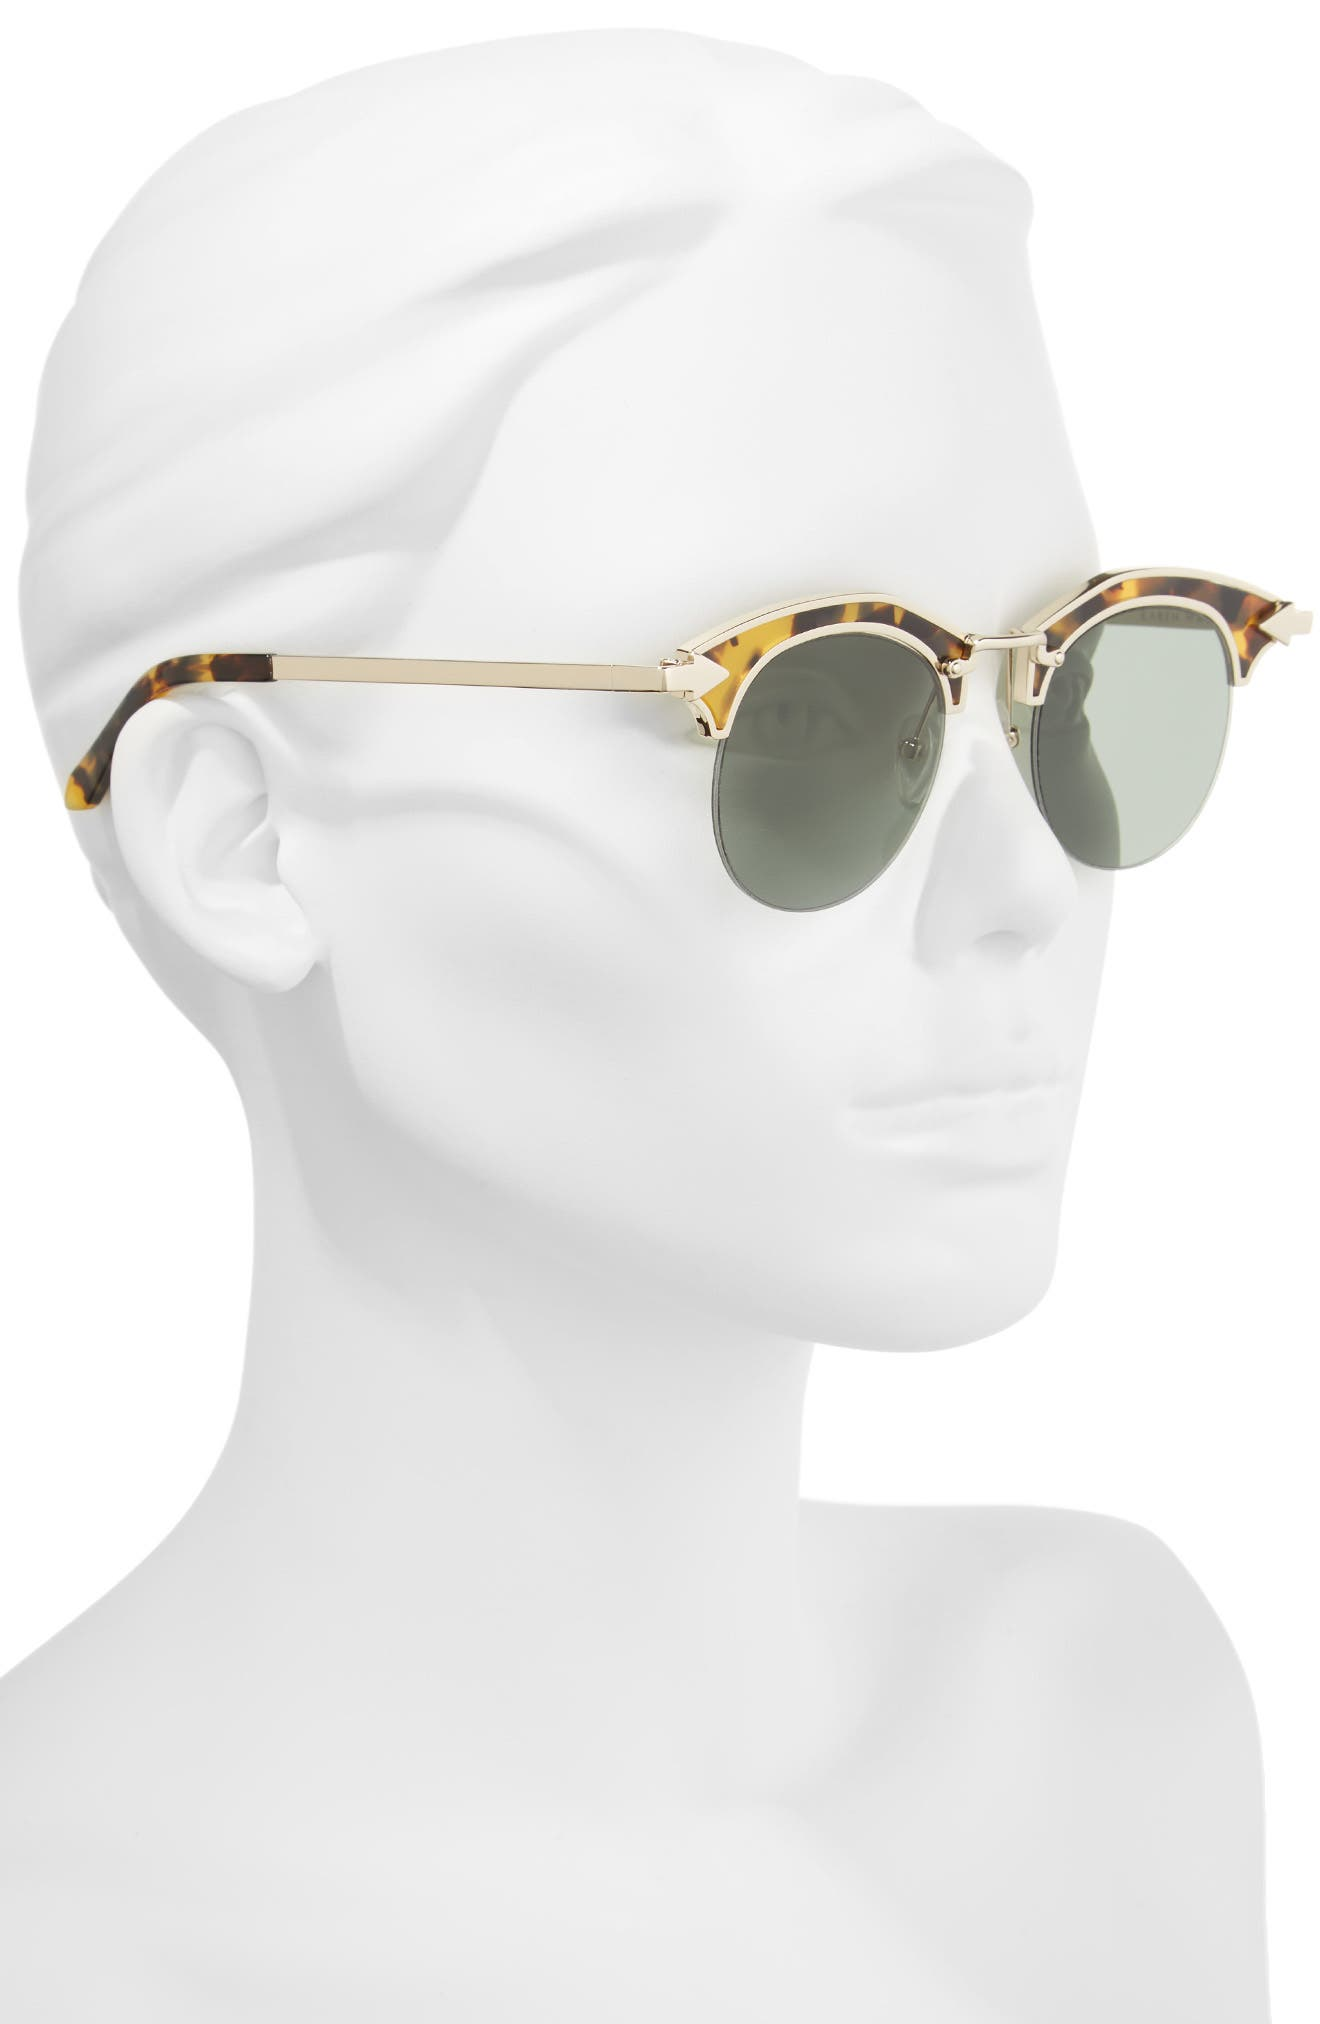 Buccaneer 47mm Round Sunglasses,                             Alternate thumbnail 5, color,